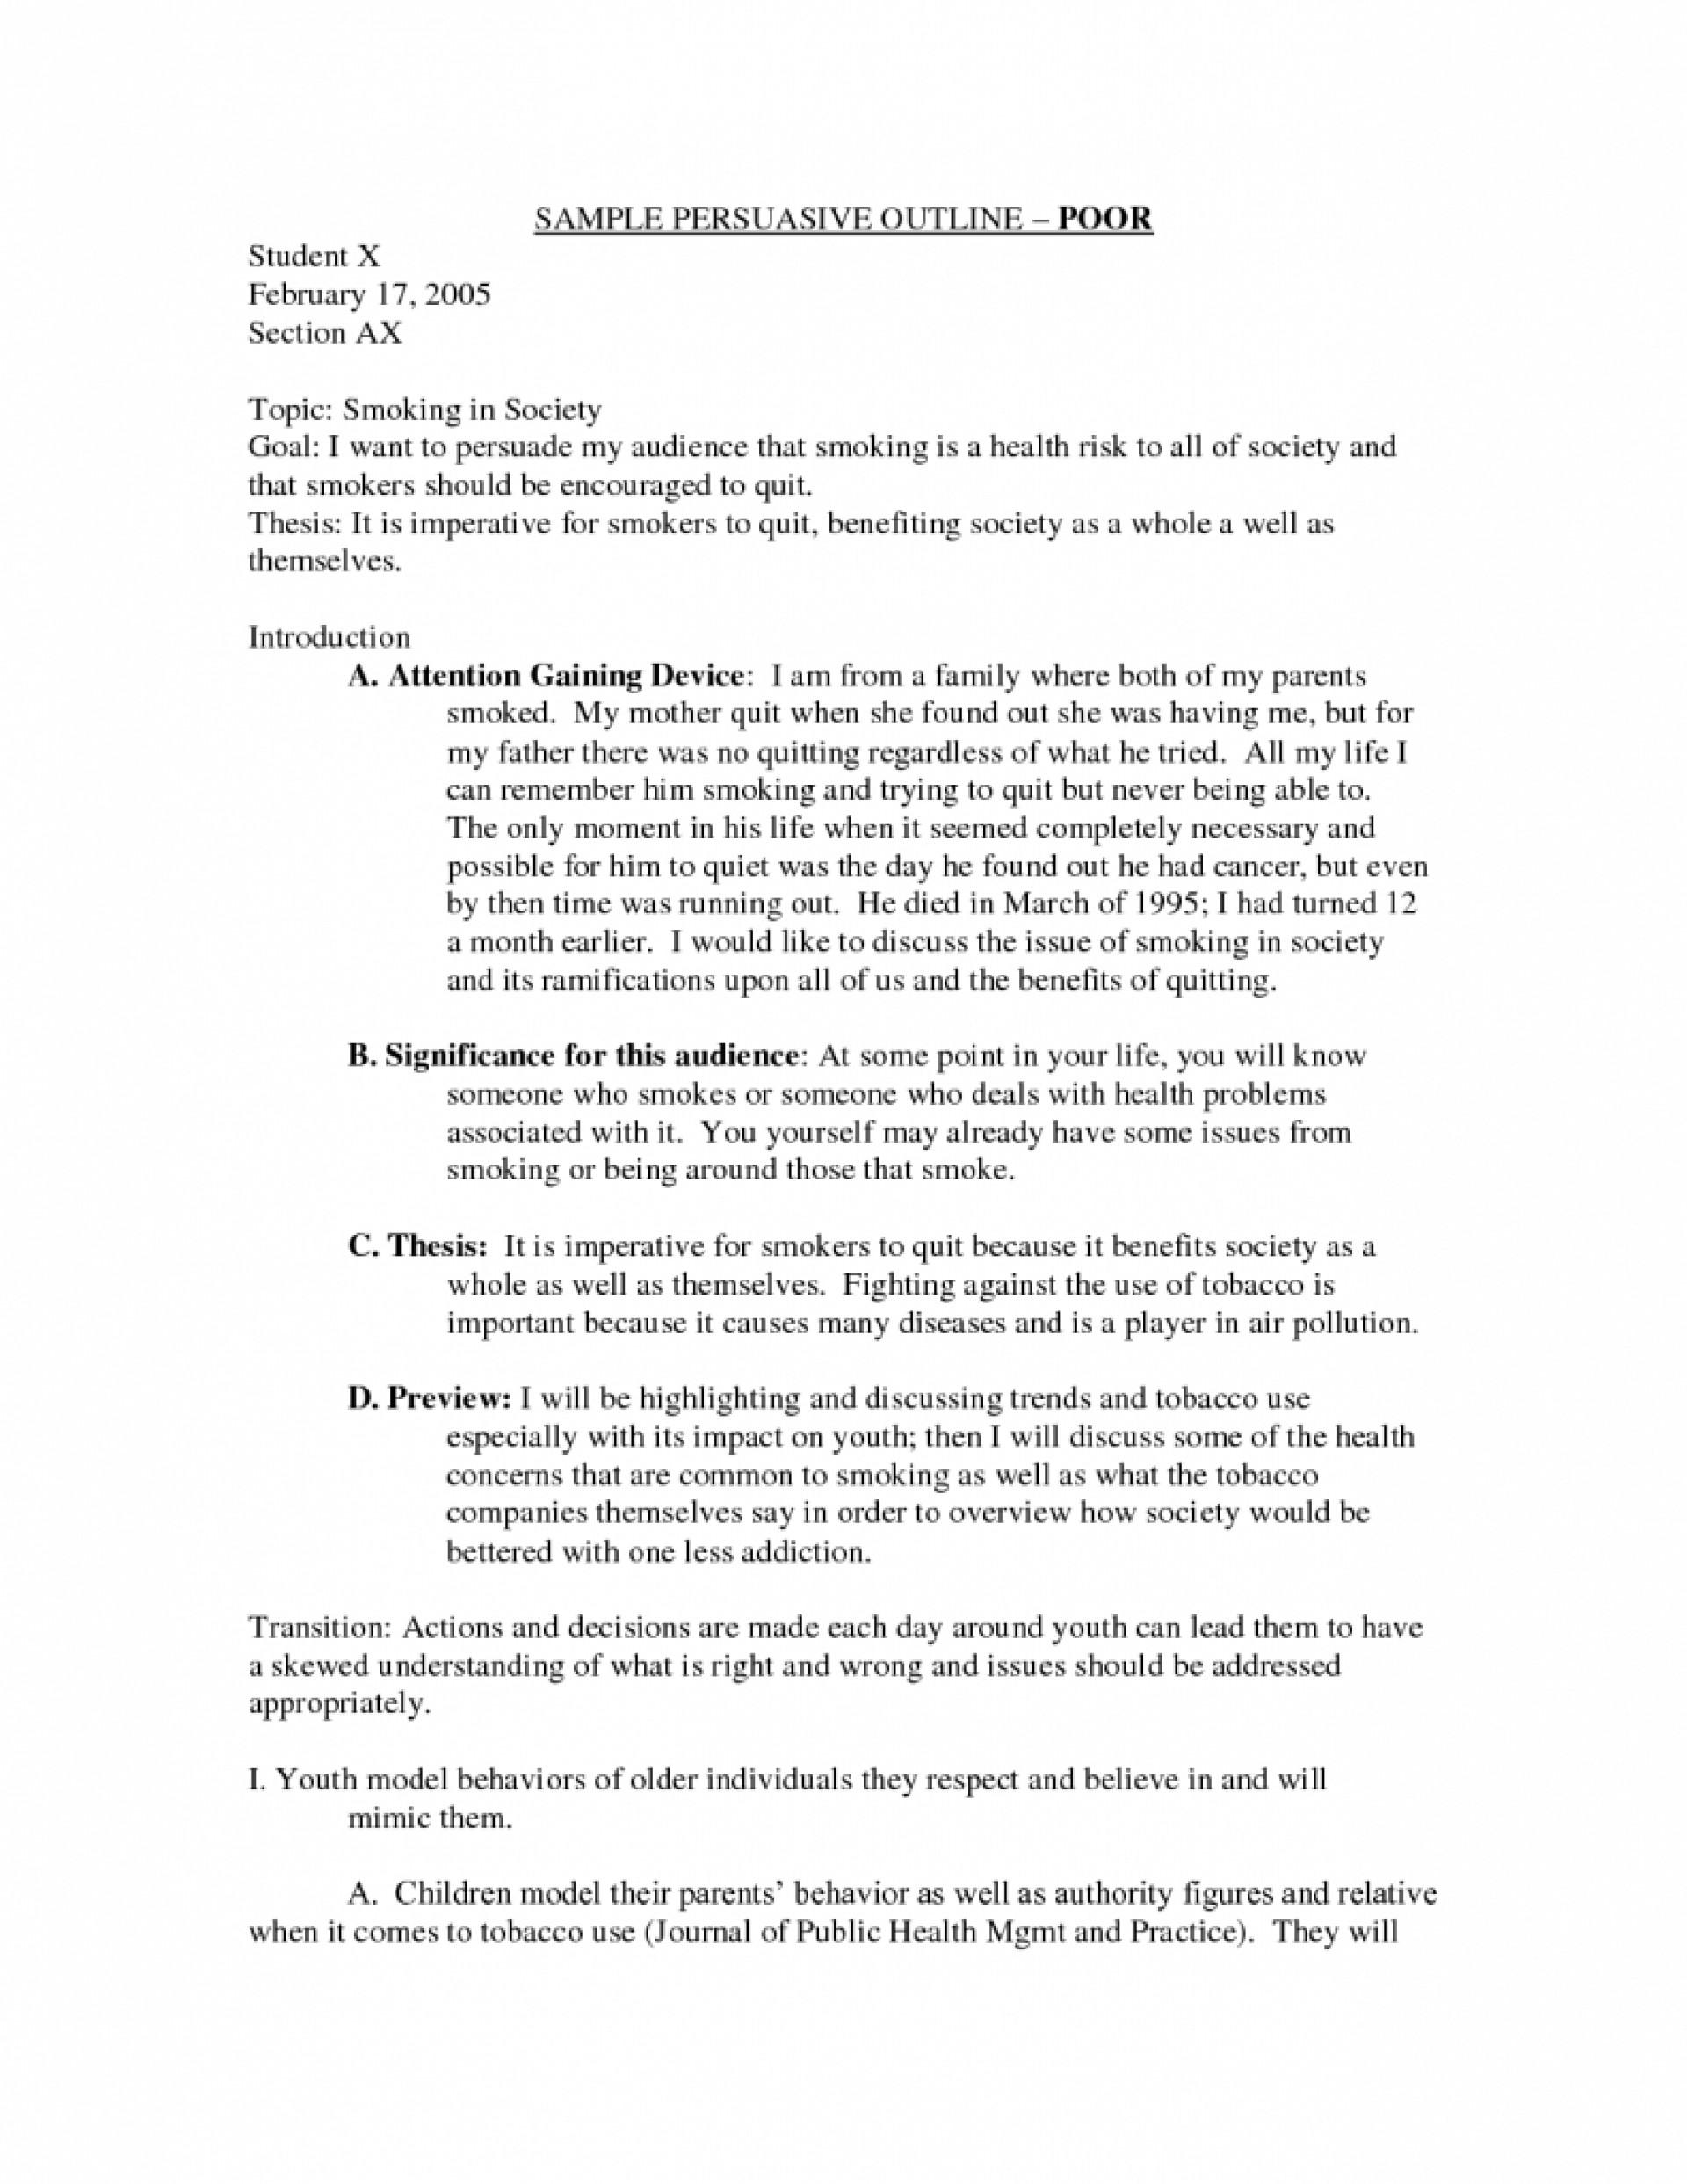 004 Middle School Persuasive Essays Poemsrom Co Animal Rights Outline Sample High Gse Bookbinder Argumentative This I Believe Impressive Essay 1920